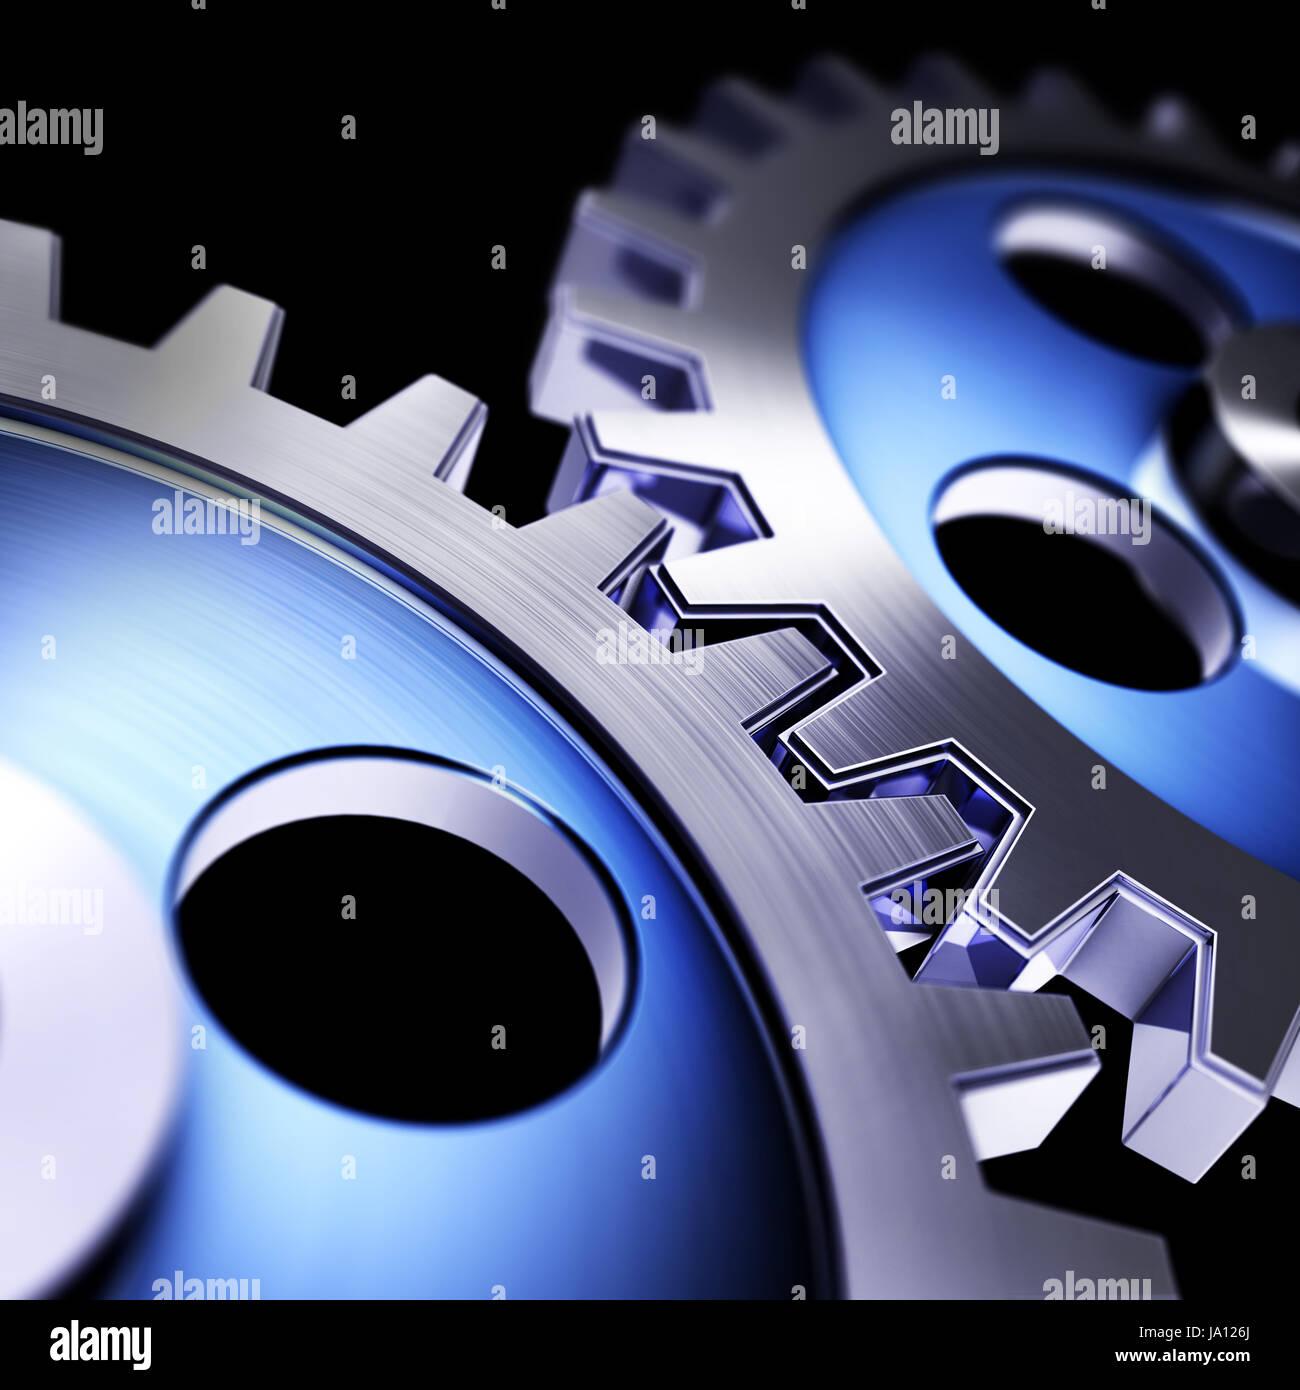 engine, drive, motor, gear, gear wheels, motivation, success, blue, team work, Stock Photo